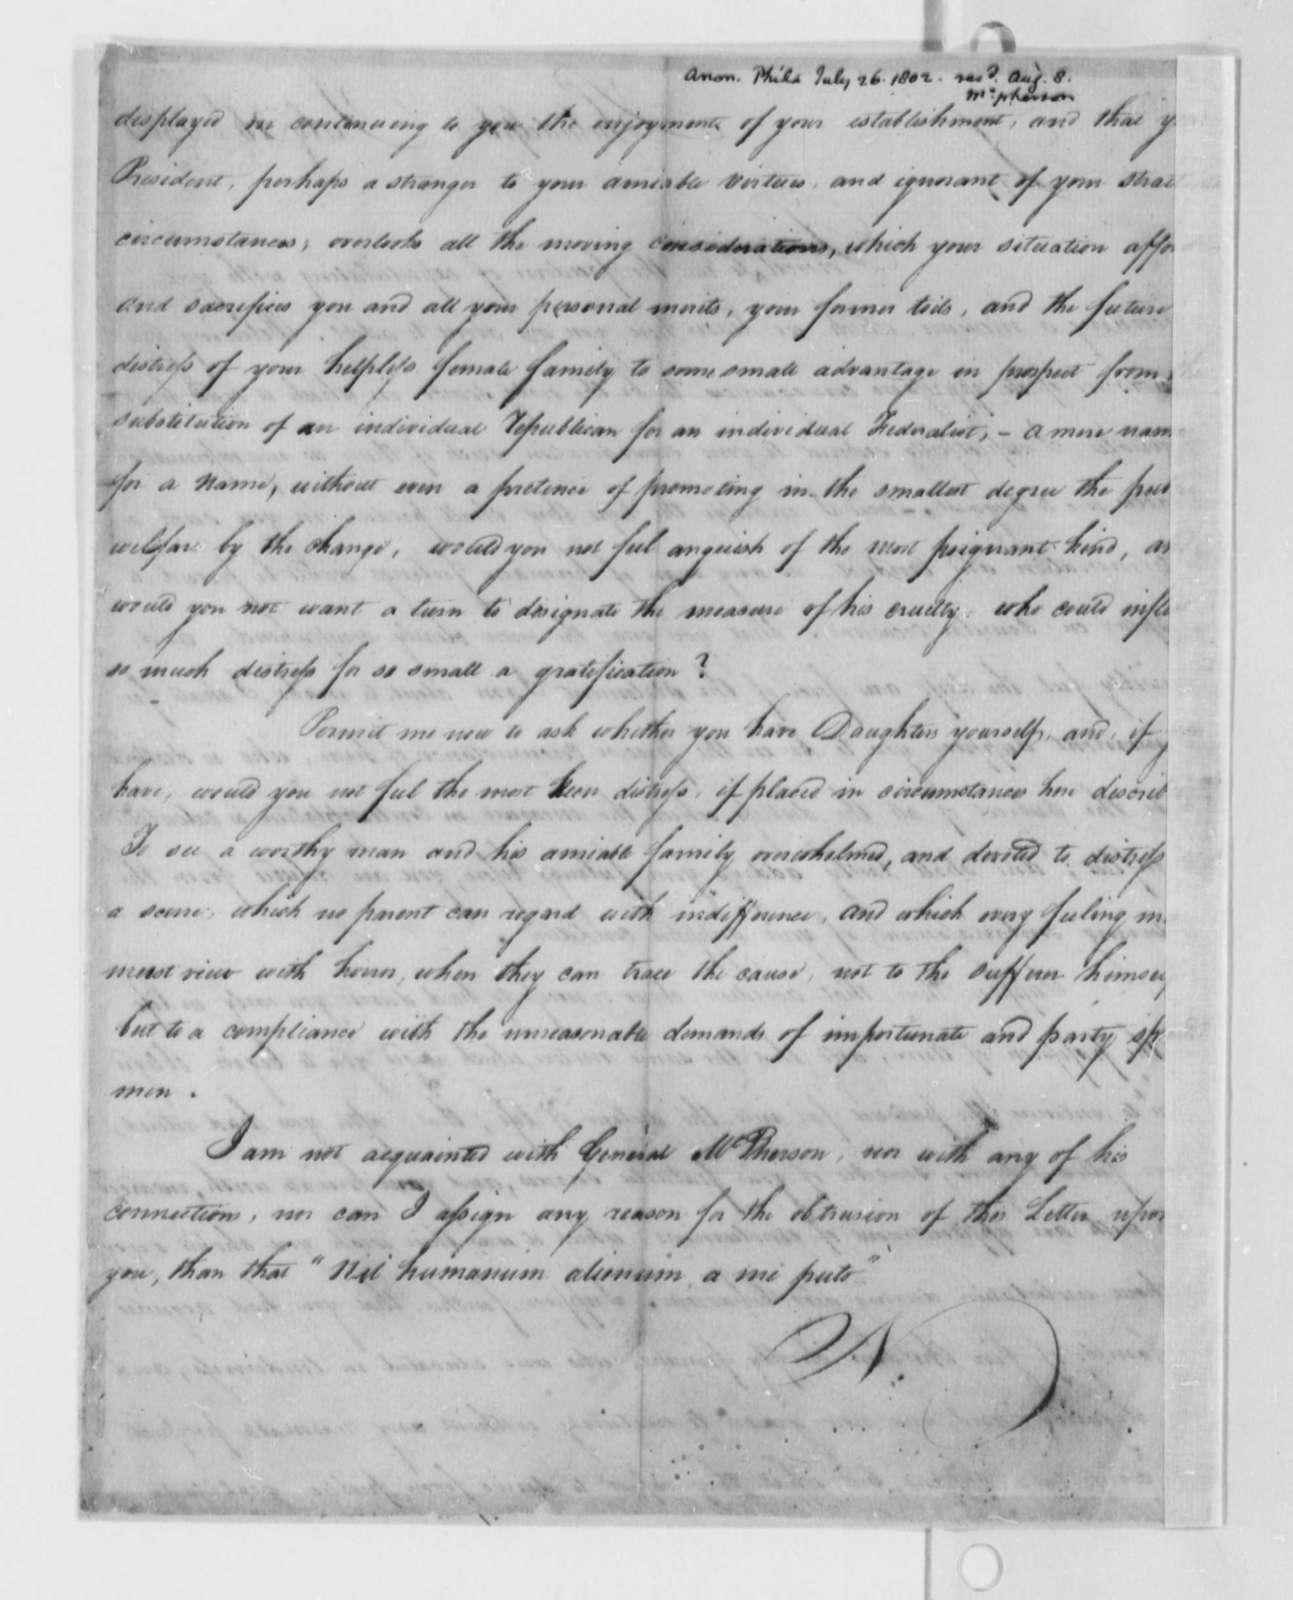 Anonymous to Thomas Jefferson, July 26, 1802